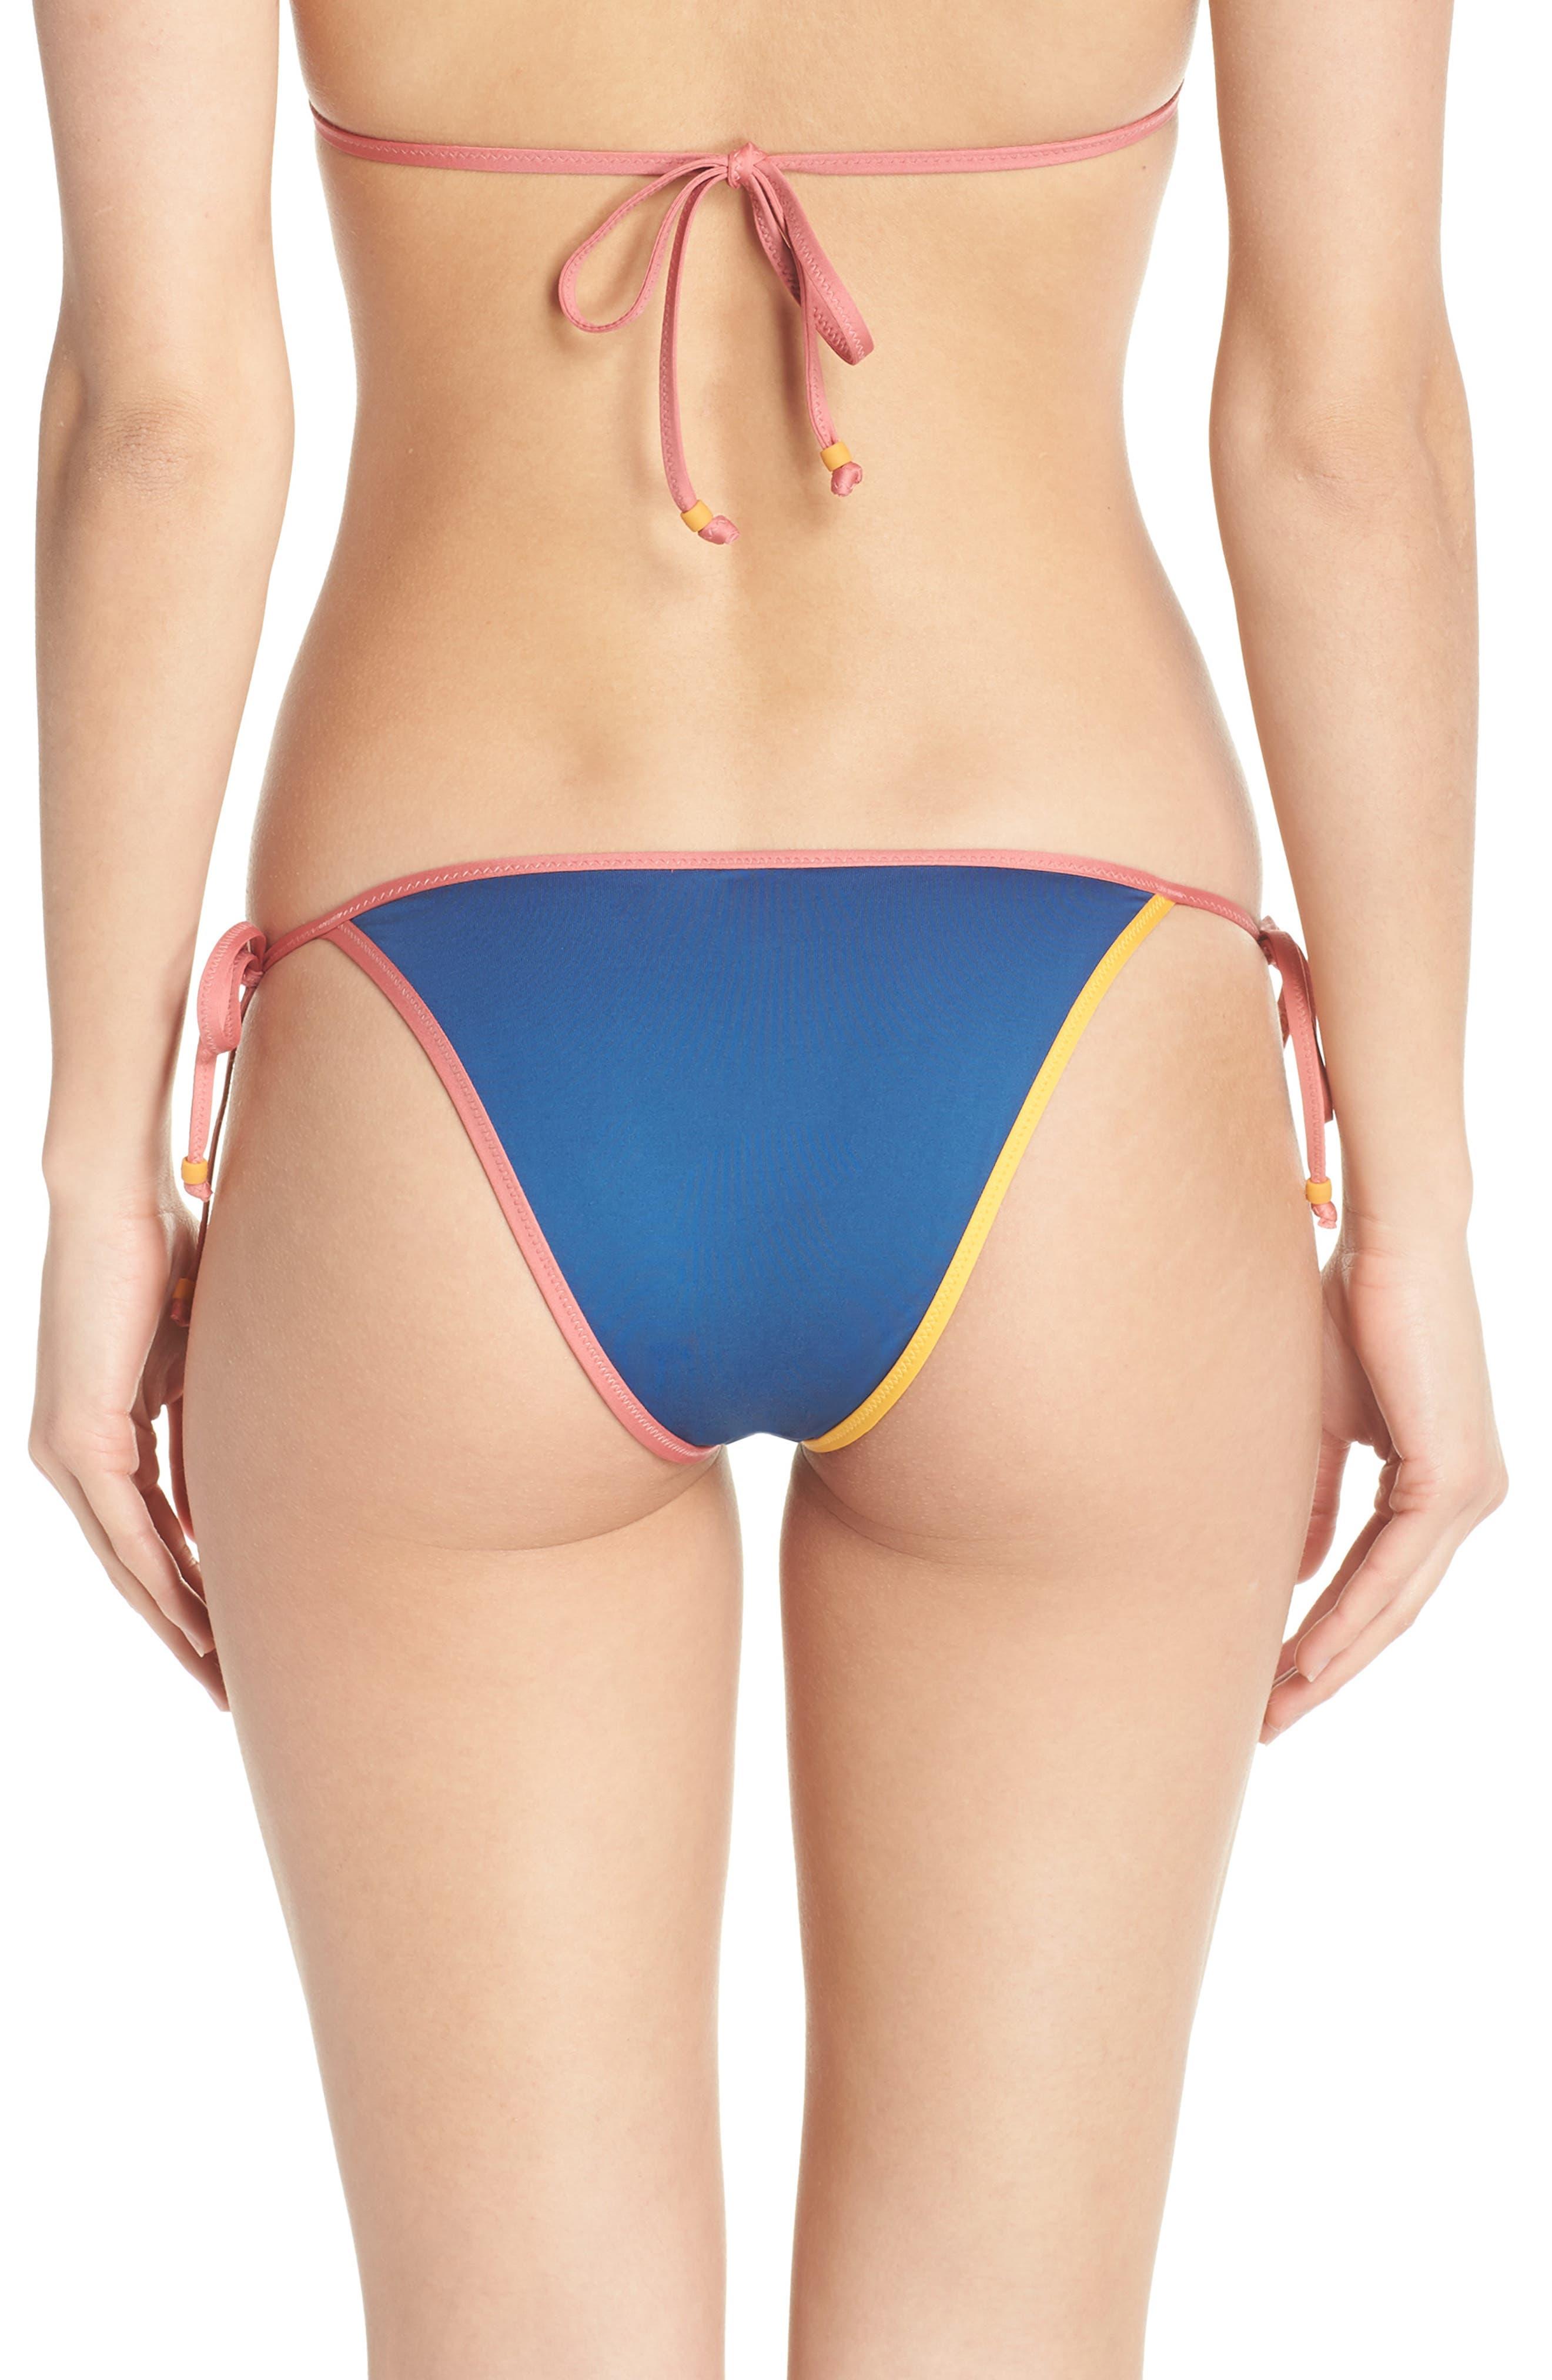 Playa Miami String Bikini Bottoms,                             Alternate thumbnail 2, color,                             Pacific Ocean Multi